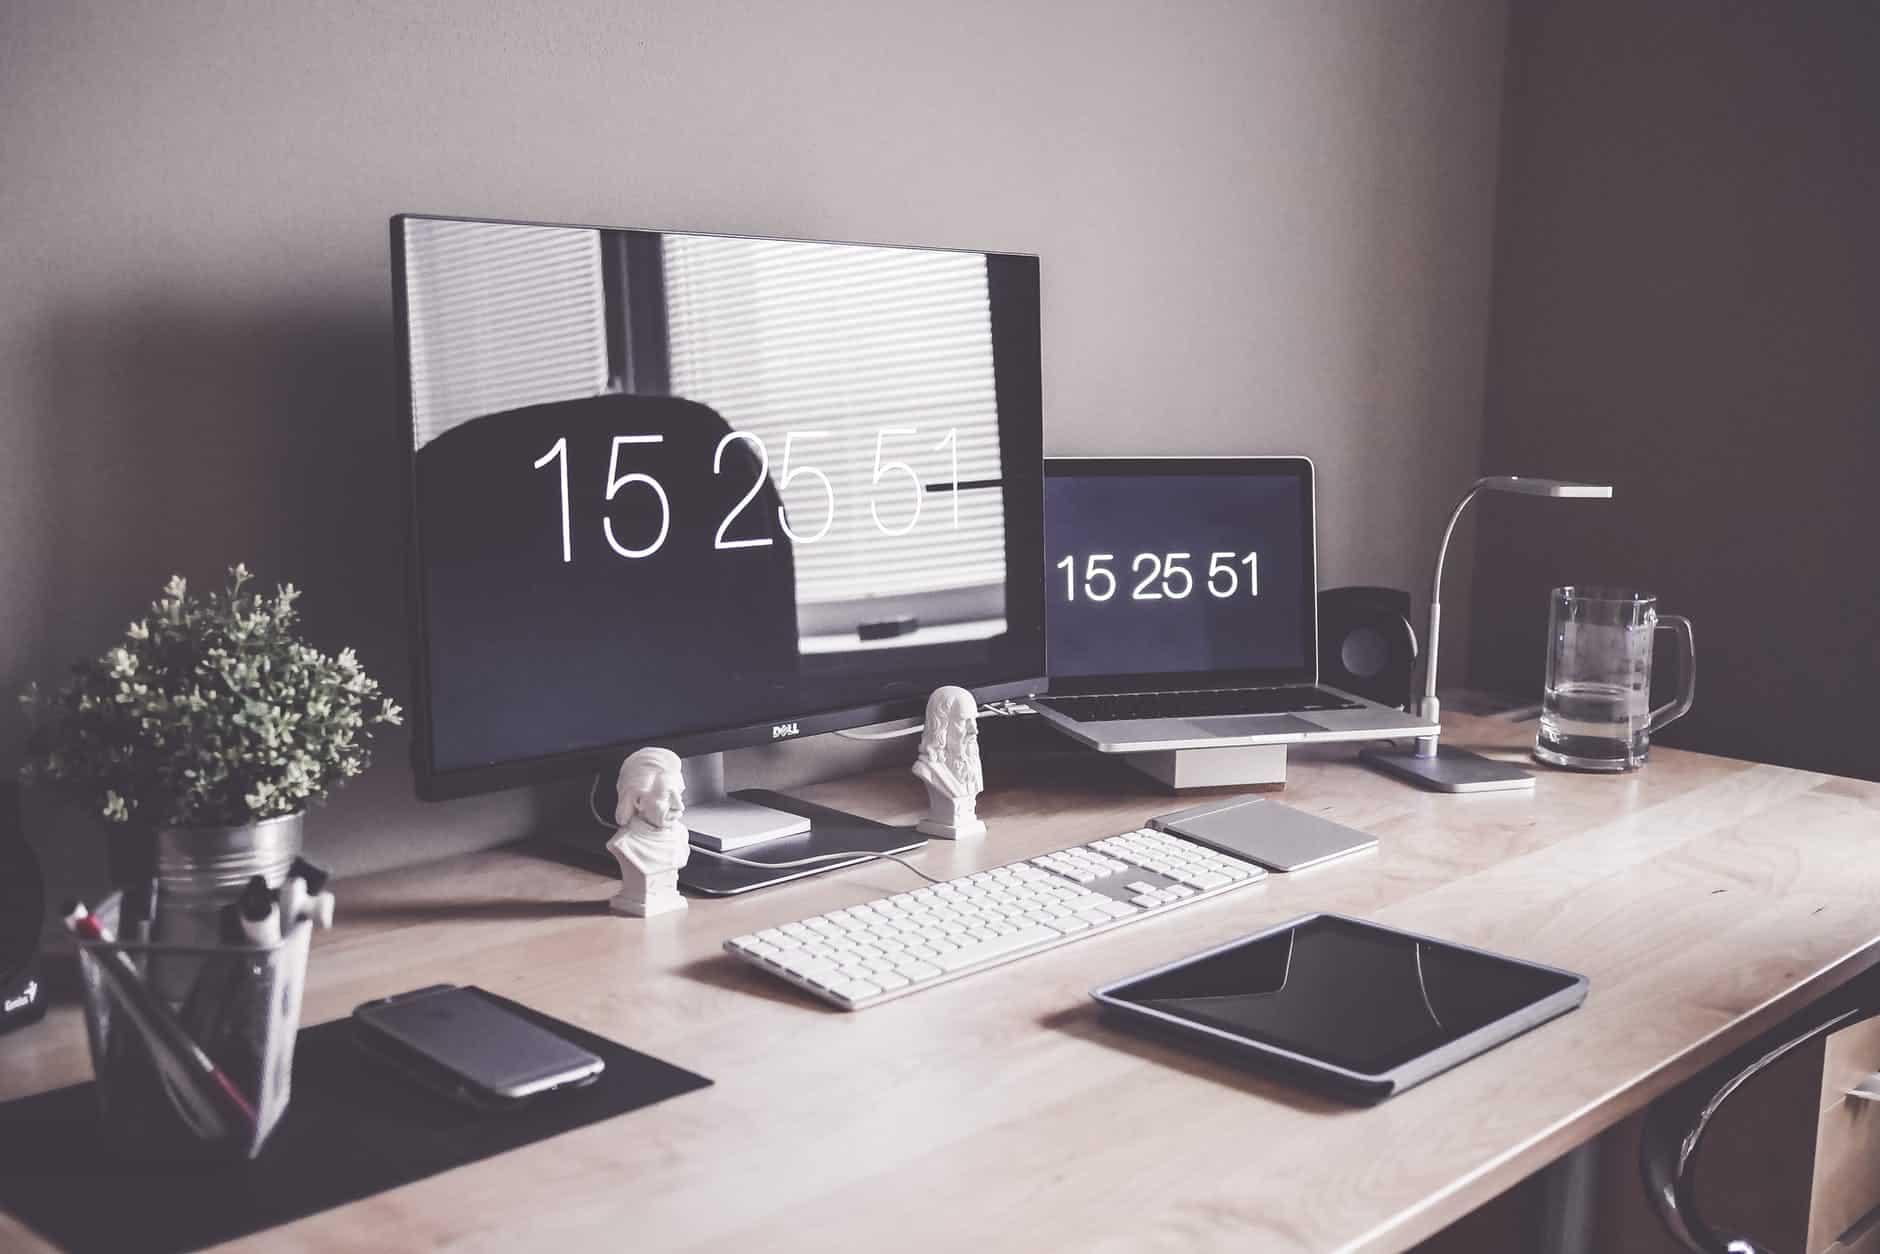 laptops vs ipad for notes-taking